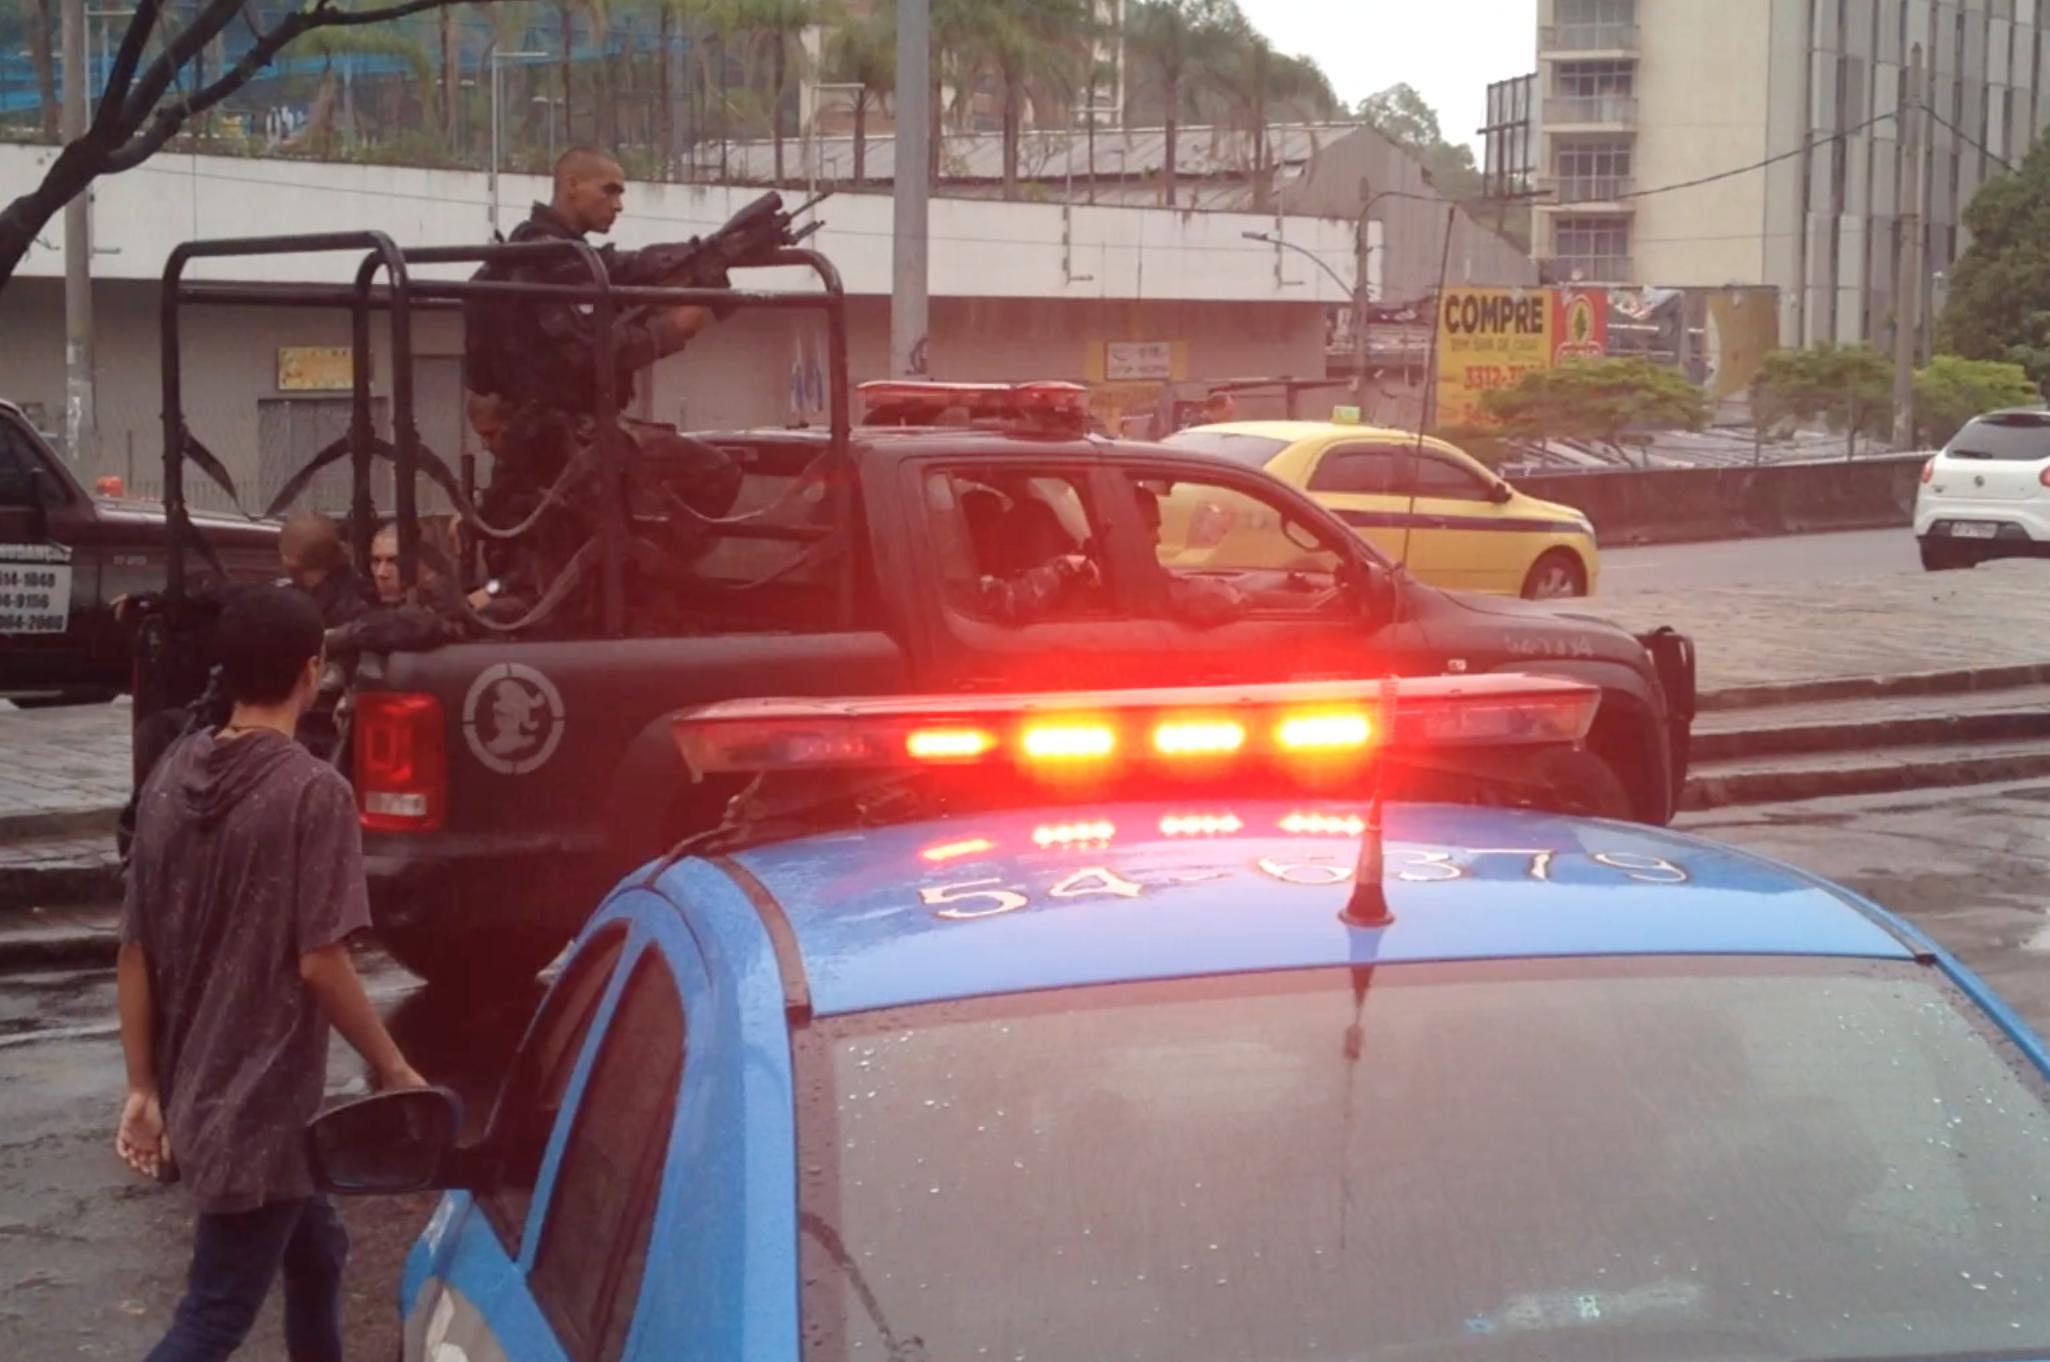 Polizei und Militärs in Rios Favelas (Foto: BuzzingCities Lab)